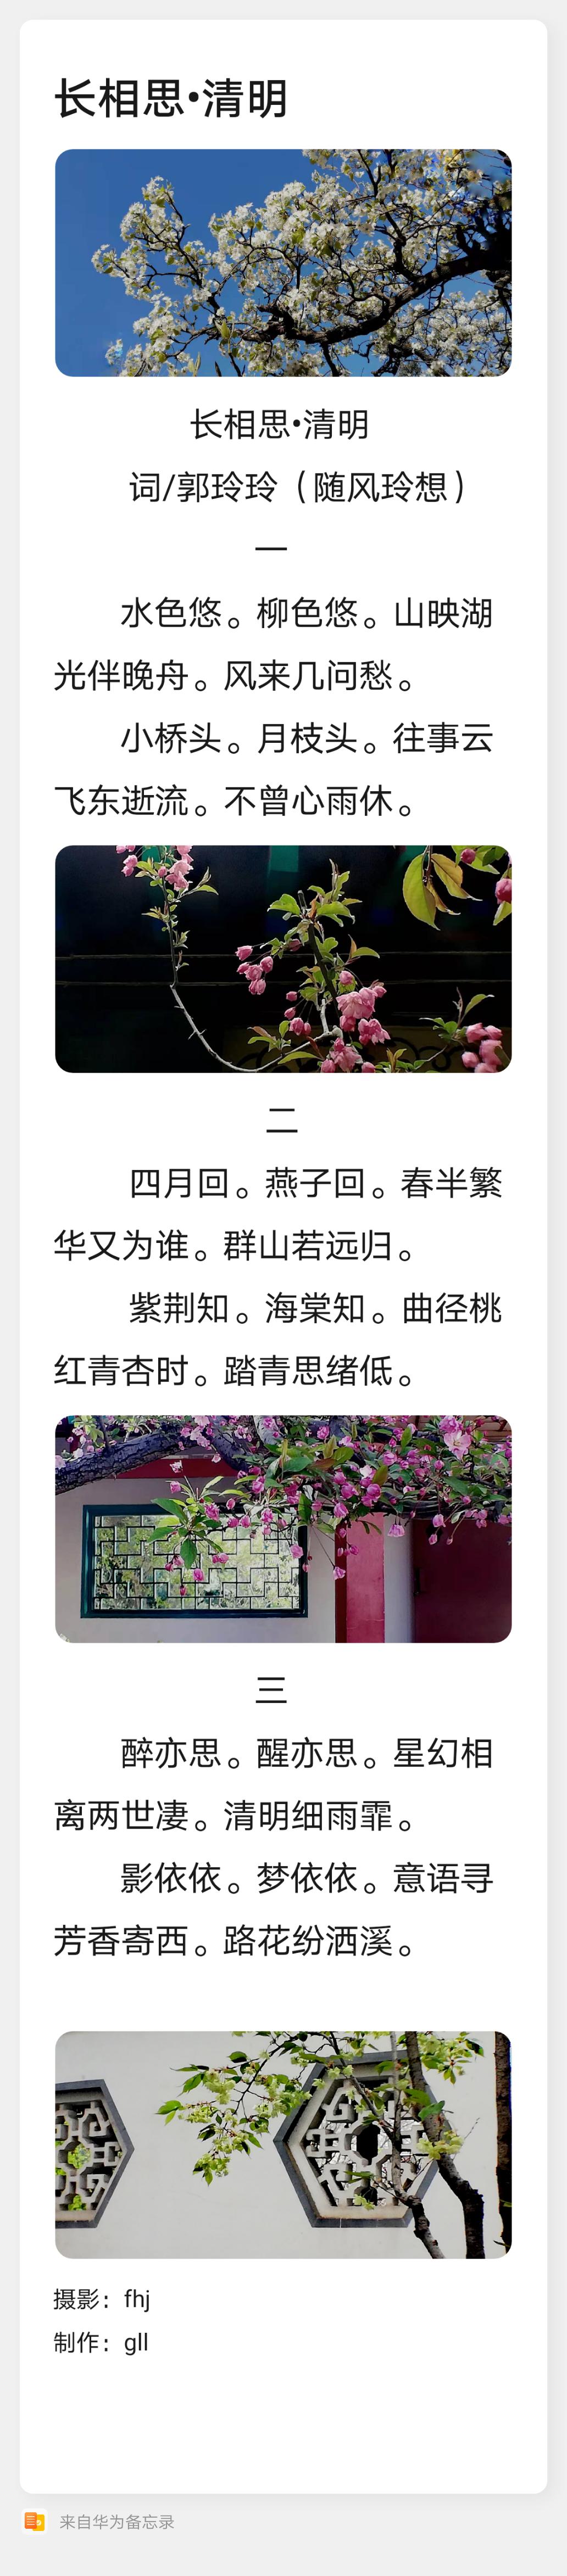 Notepad_202103291053_15280